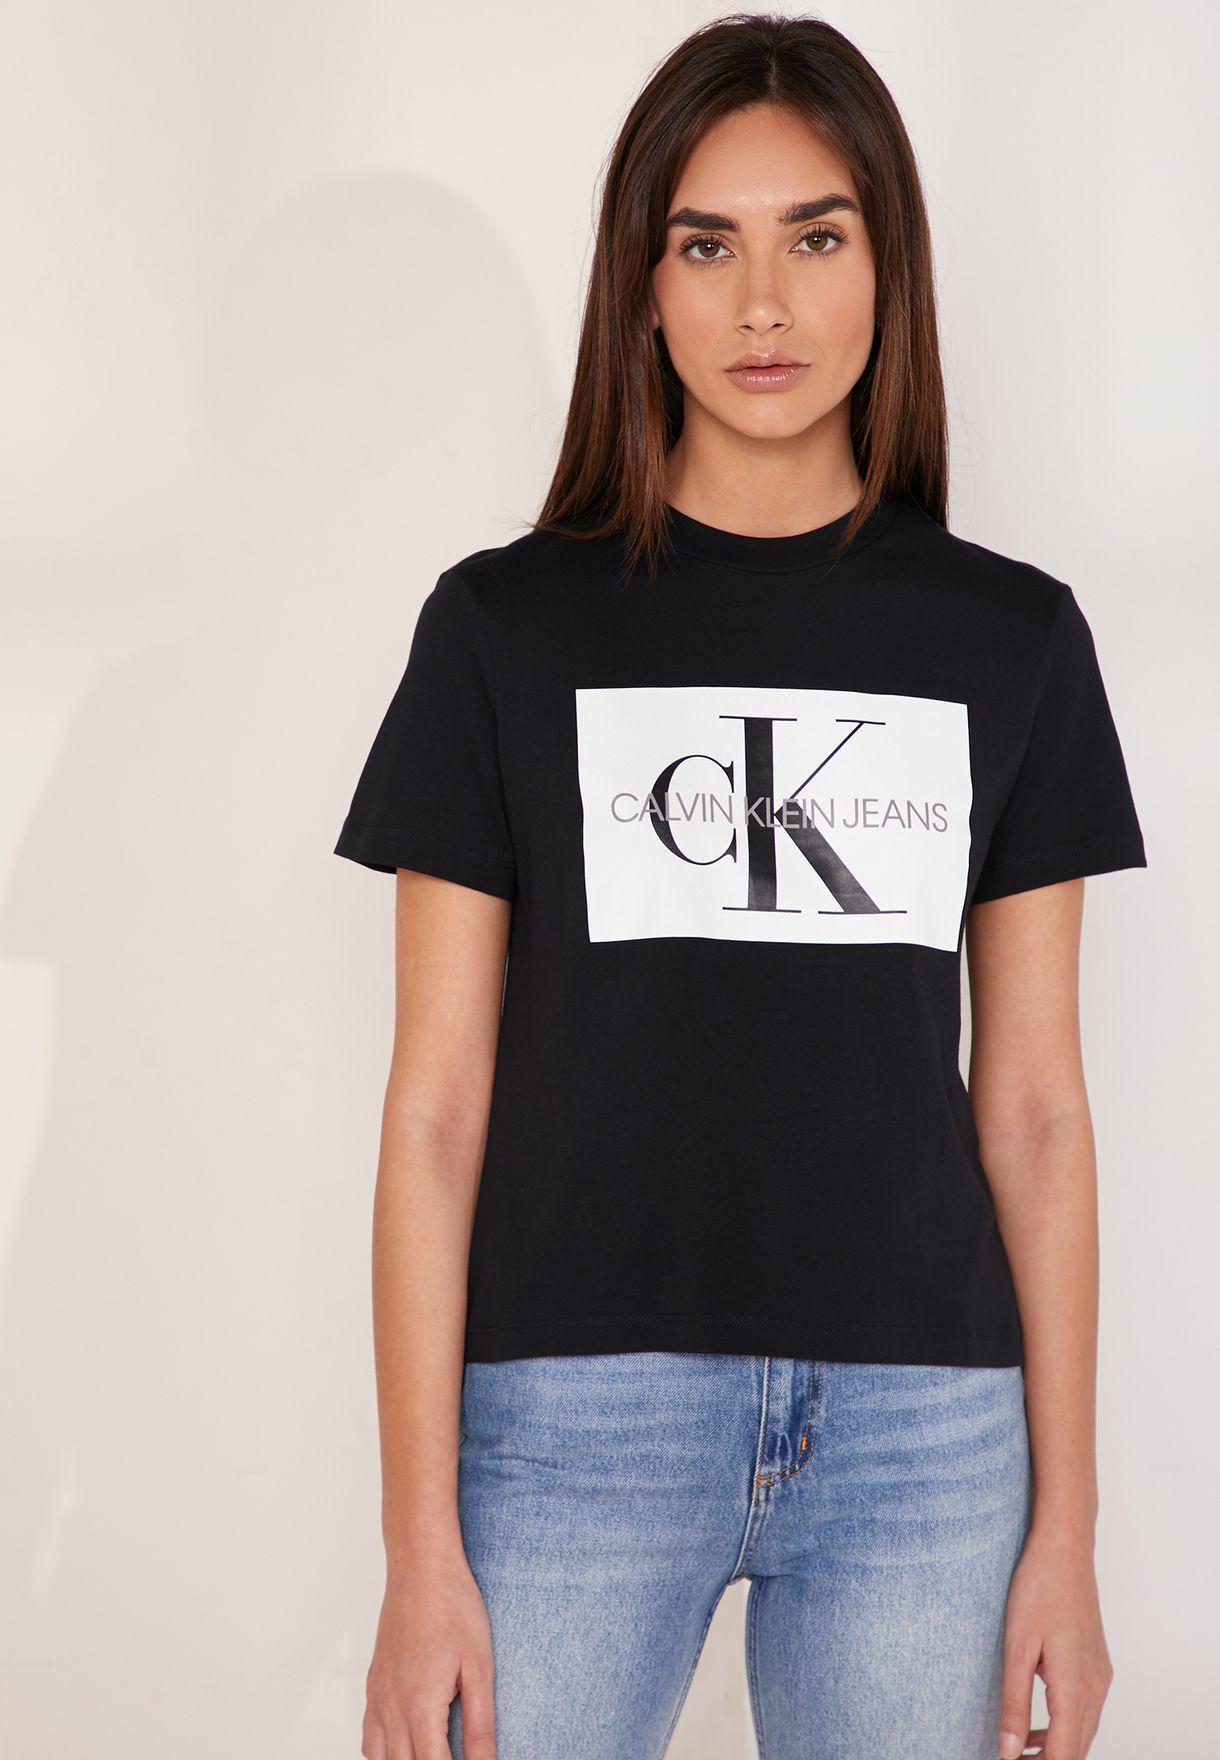 8b0f03447a1 Shop Calvin Klein Jeans black Iconic Monogram Box Logo T-Shirt ...